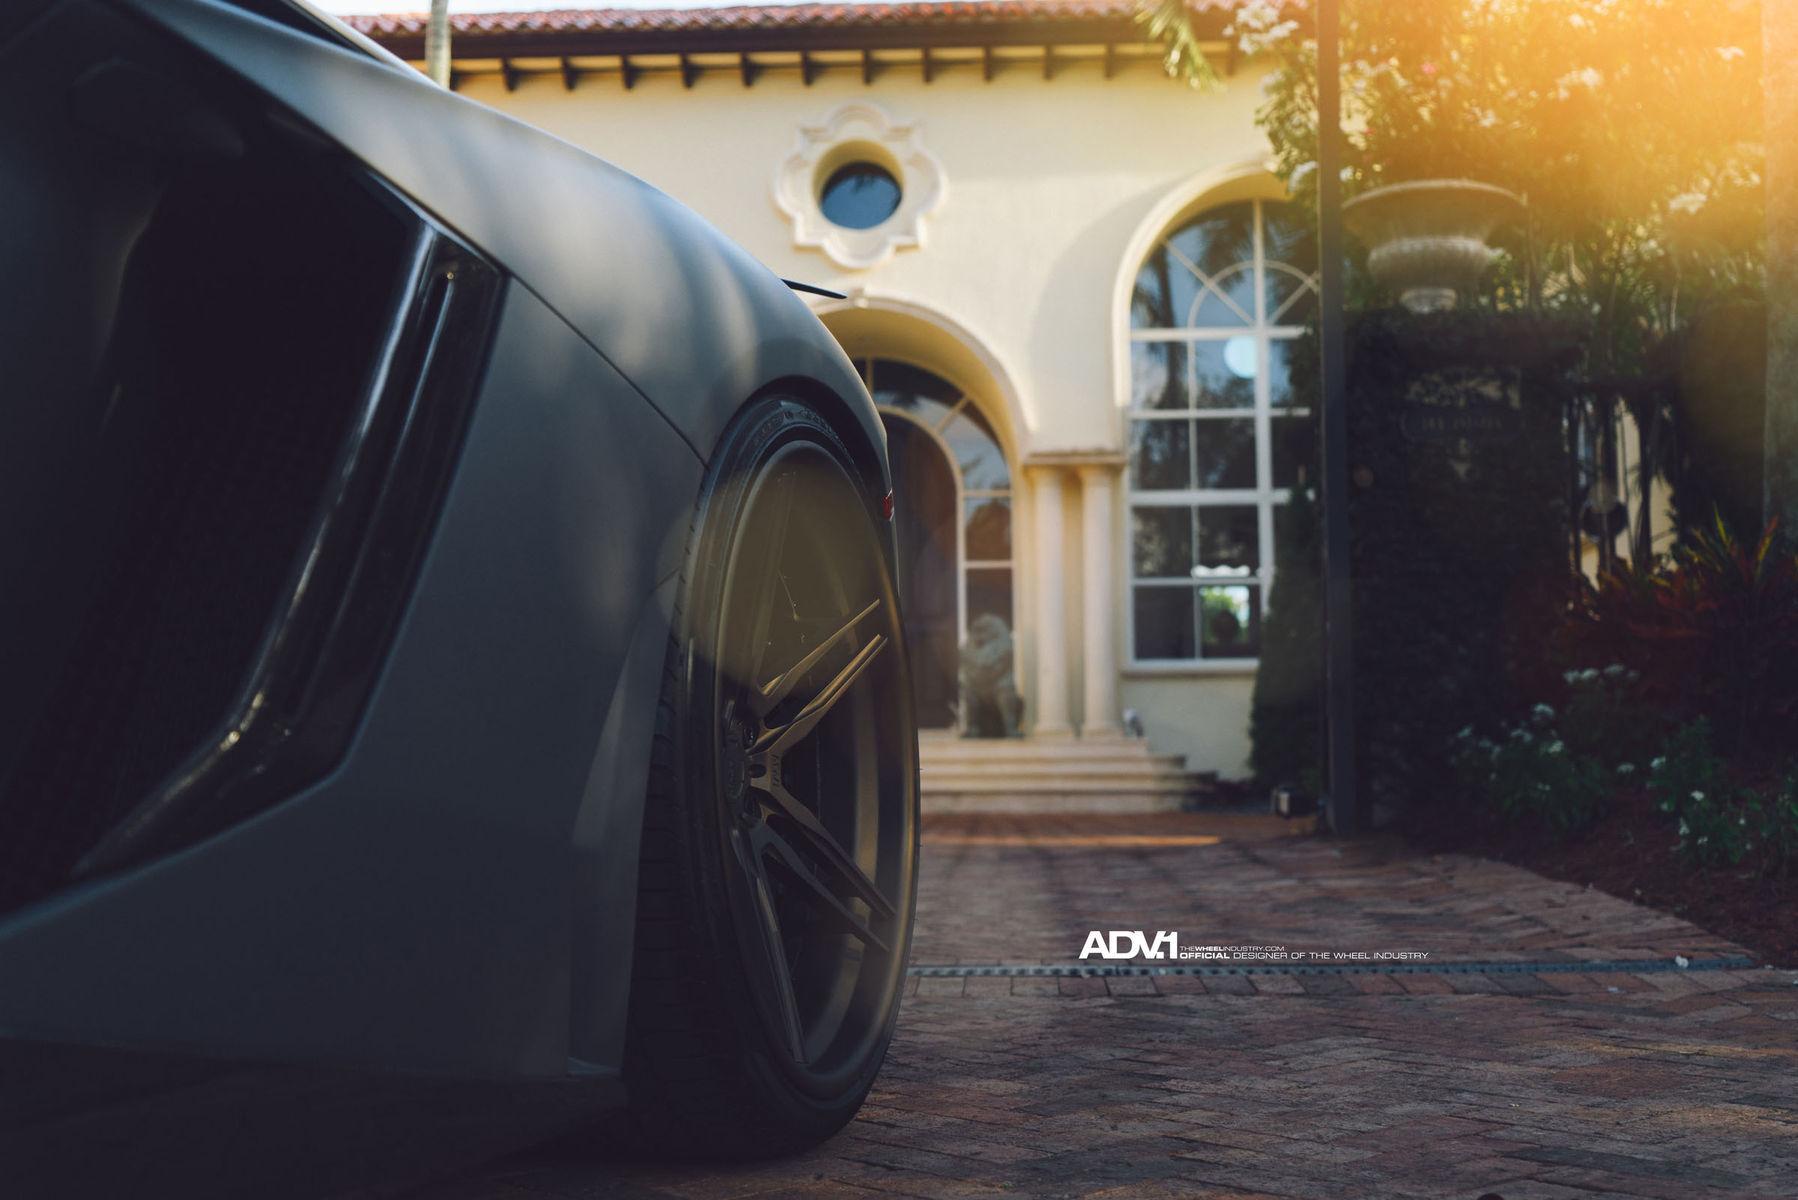 Lamborghini Aventador   ADV.1 Wheels   Lamborghini Aventador